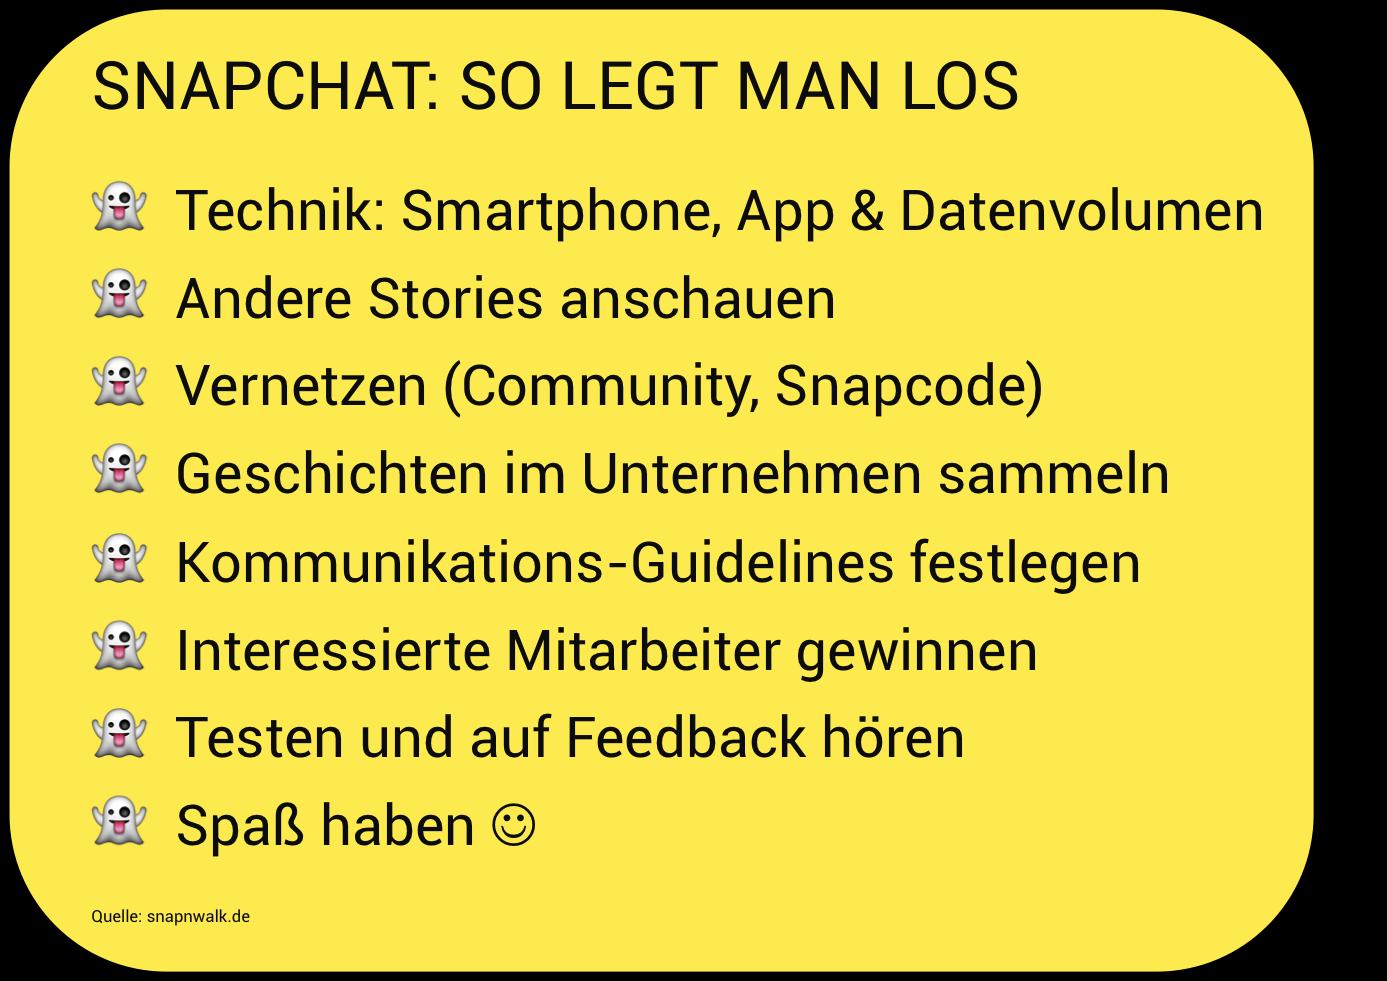 Snapnwalk Snapchat Unternehmen loslegen.png